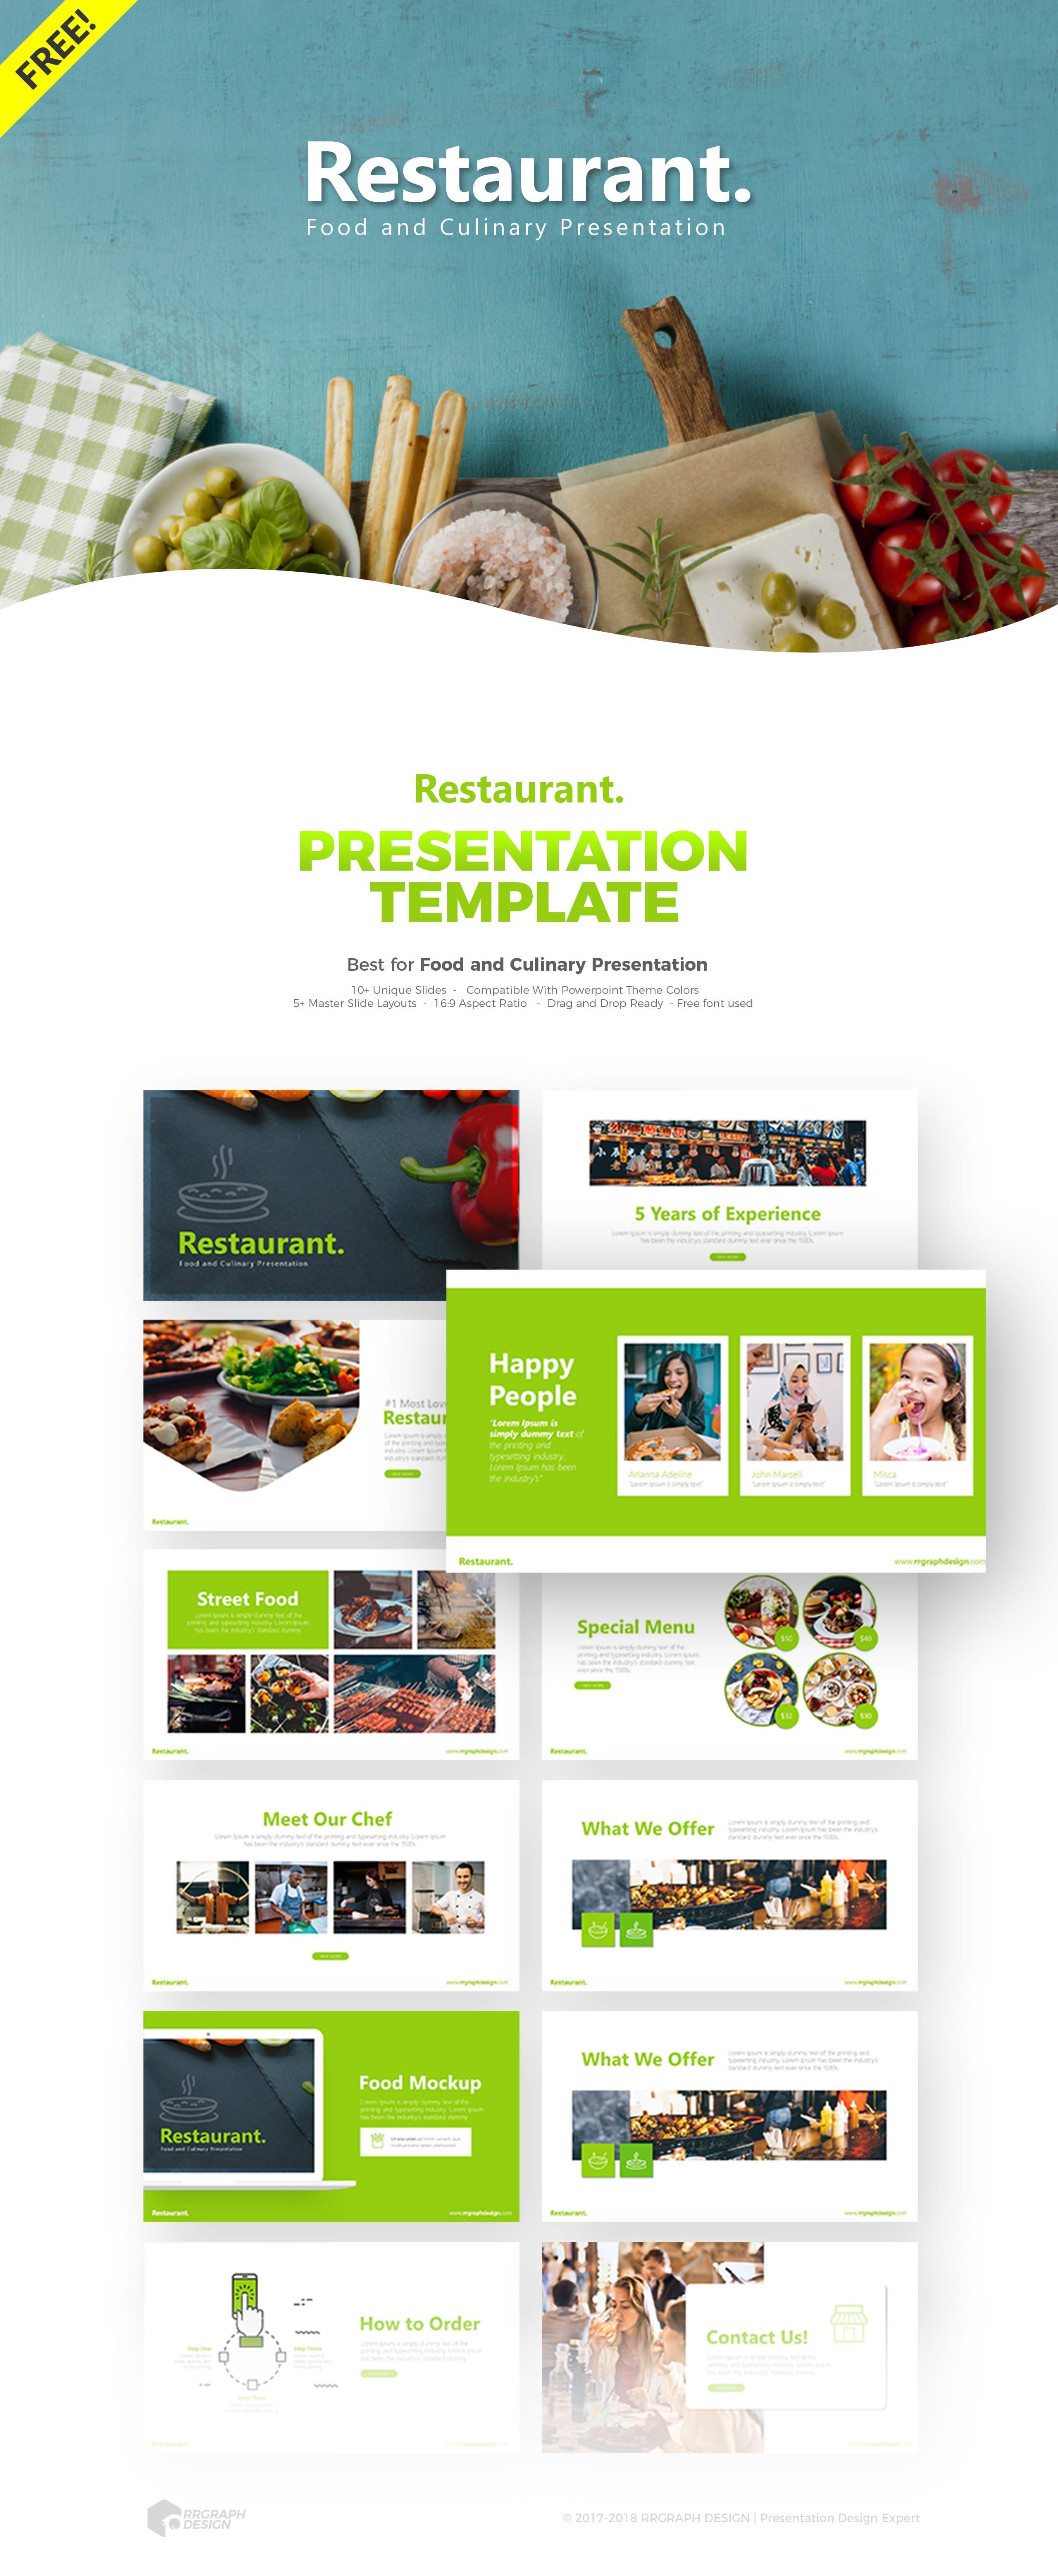 Restaurant Presentation Template Powerpoint Template Free Powerpoint Design Templates Free Powerpoint Templates Download